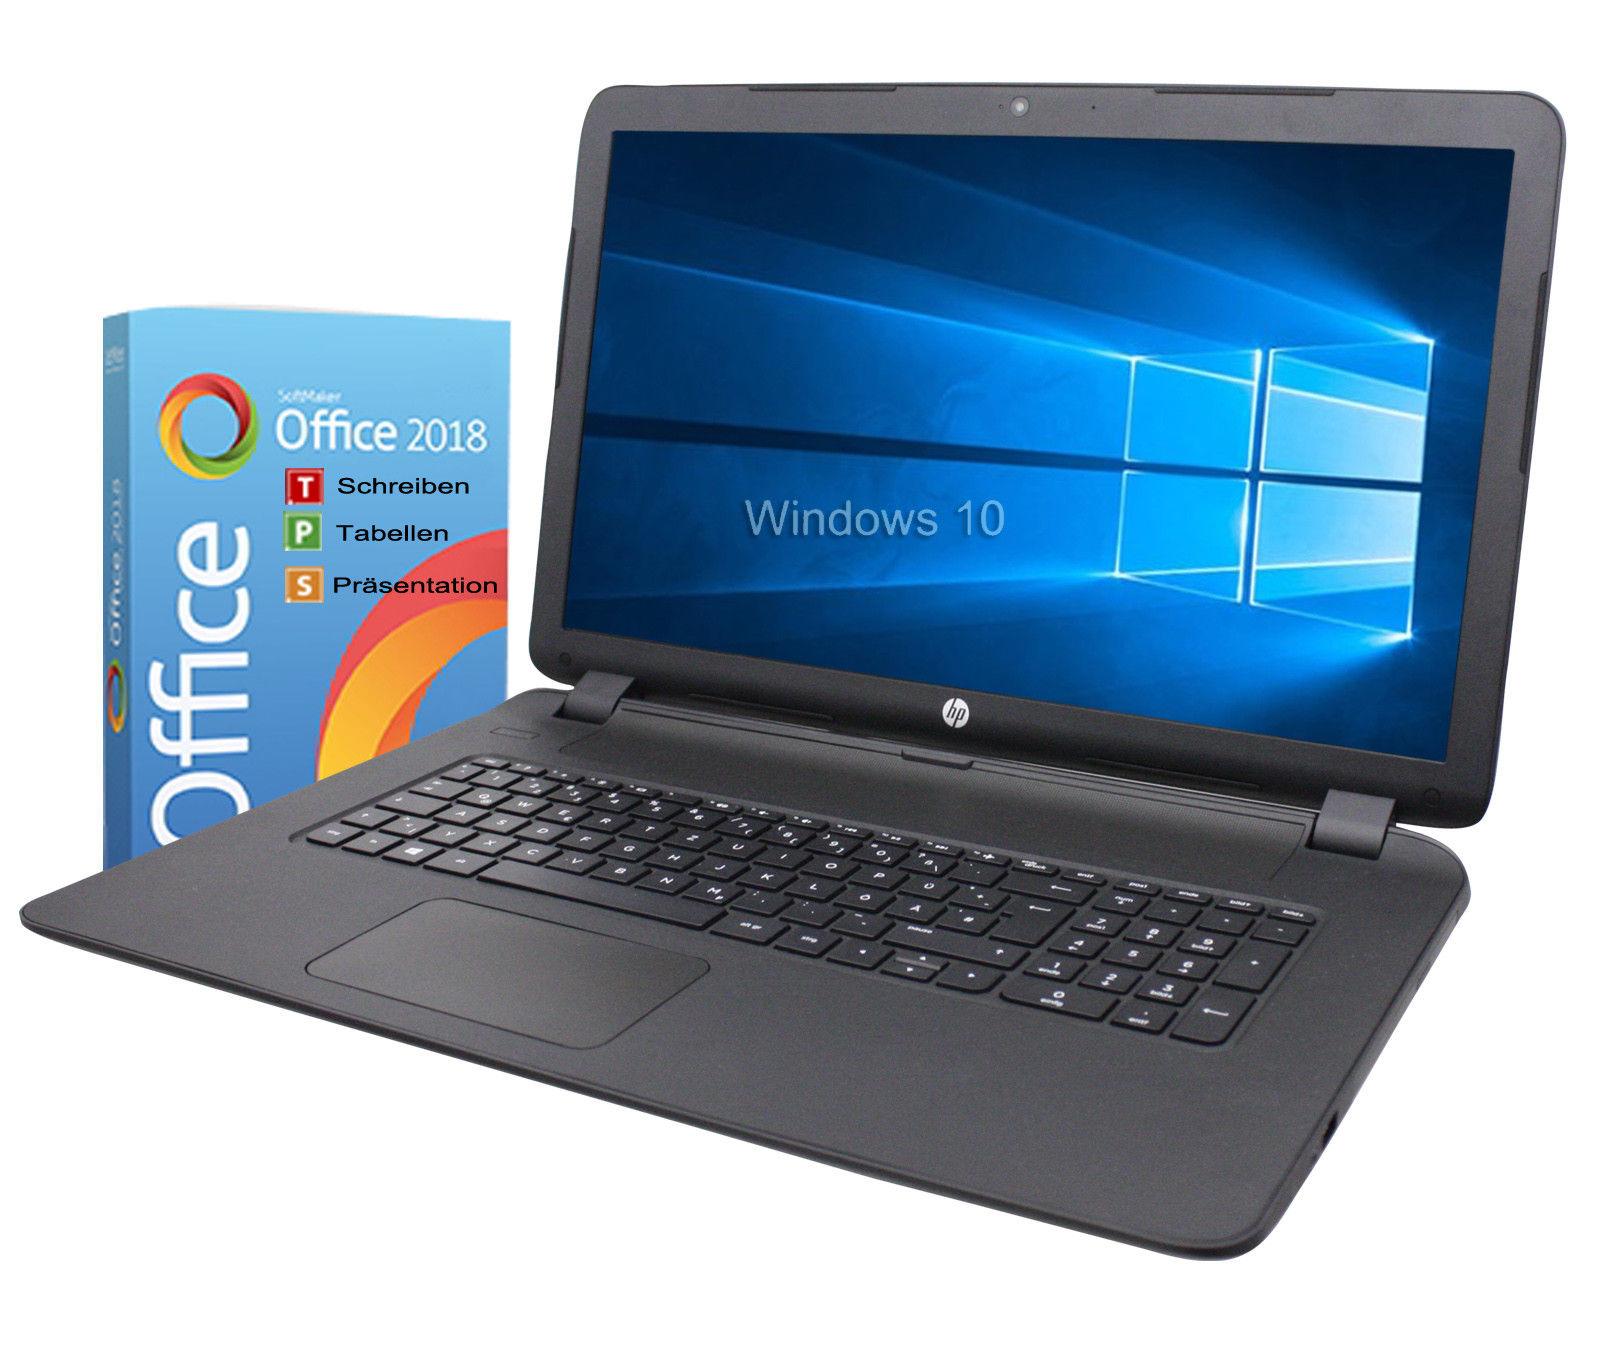 HP Notebook 17 Zoll HD+ Dual Core 2x 2,4GHz 4GB 1TB Win10 / Office 2018